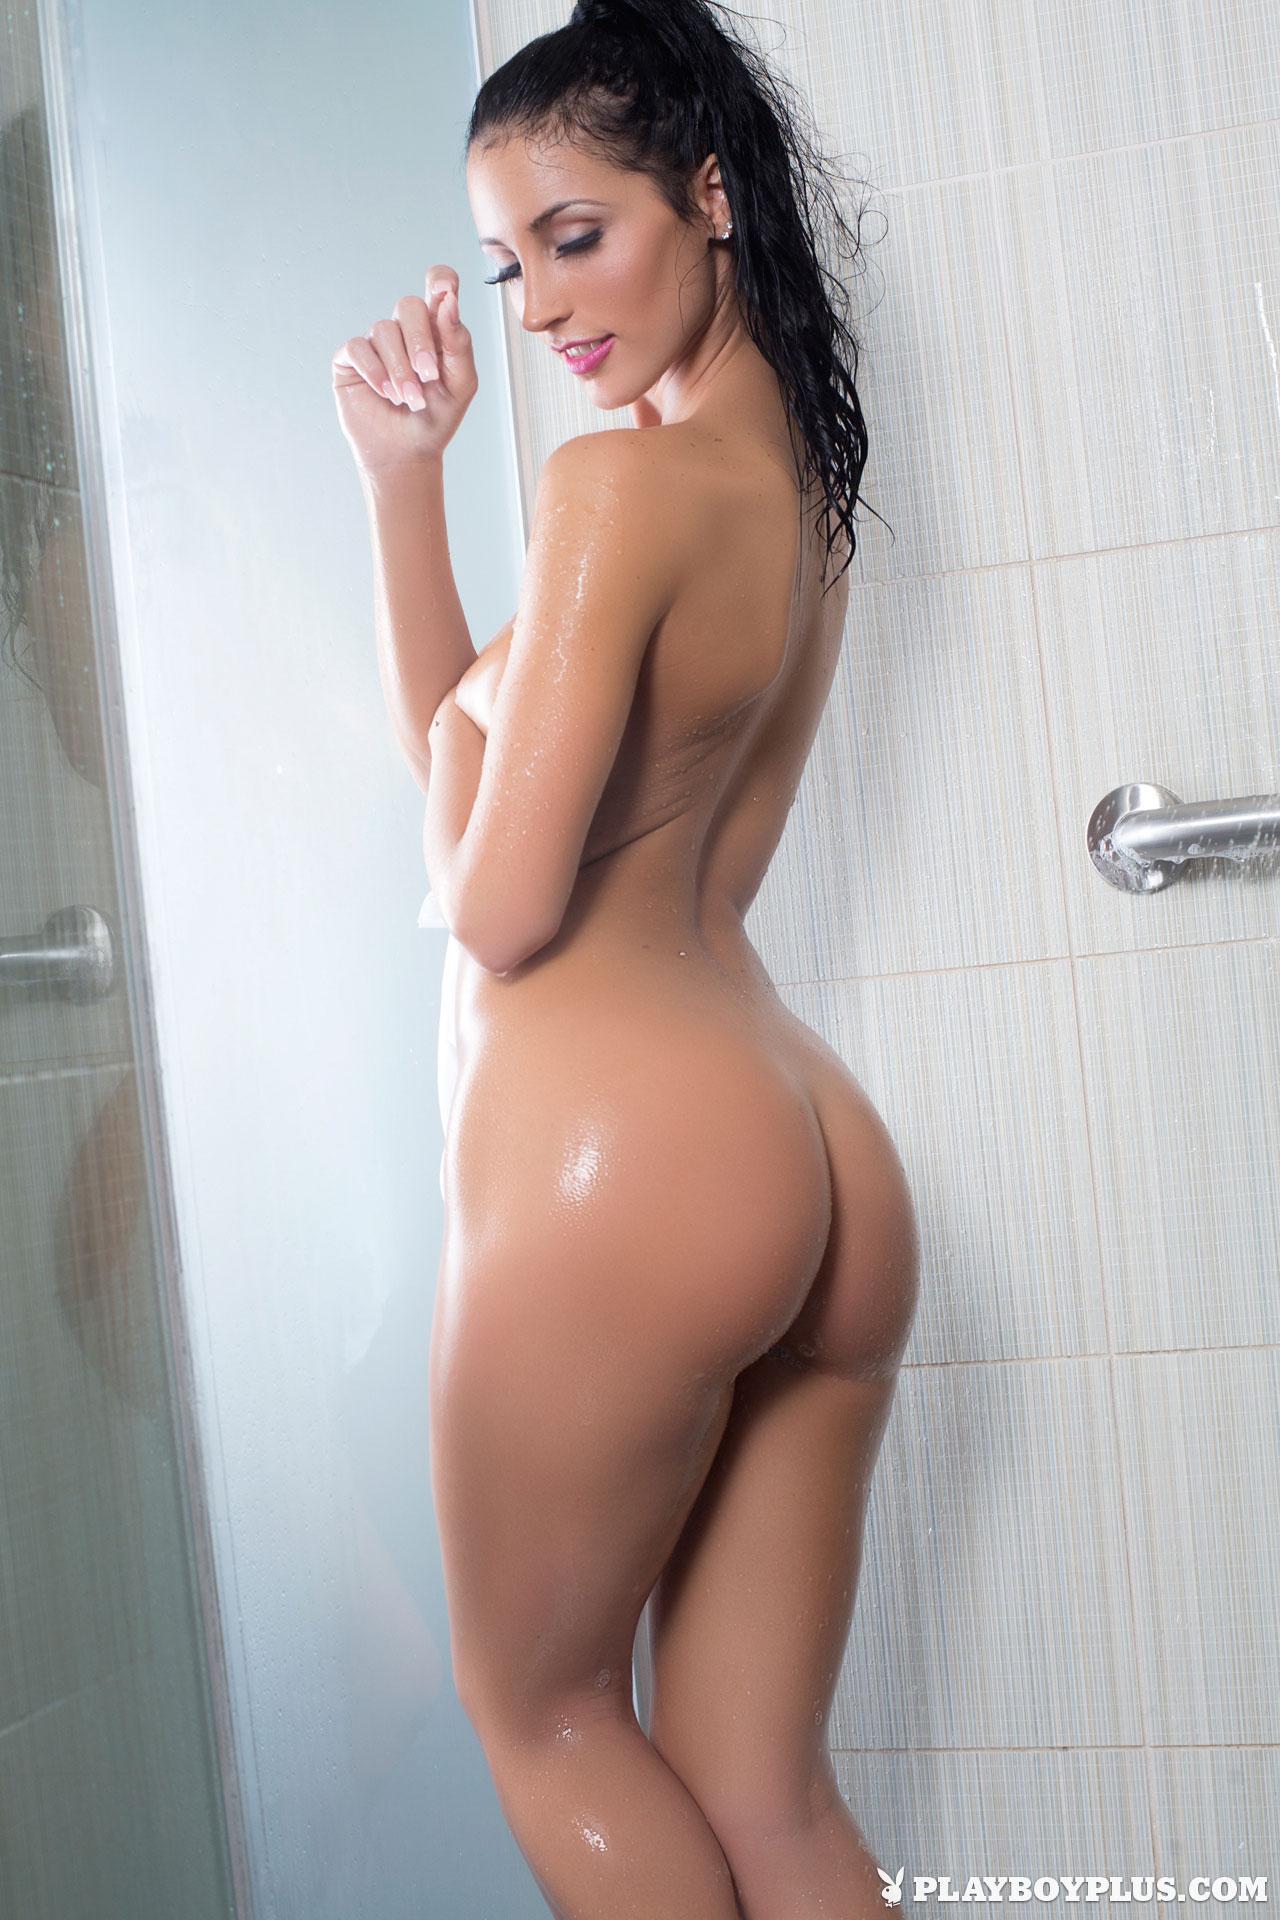 Kendra cantara wet shower naked playboy 21 RedBust